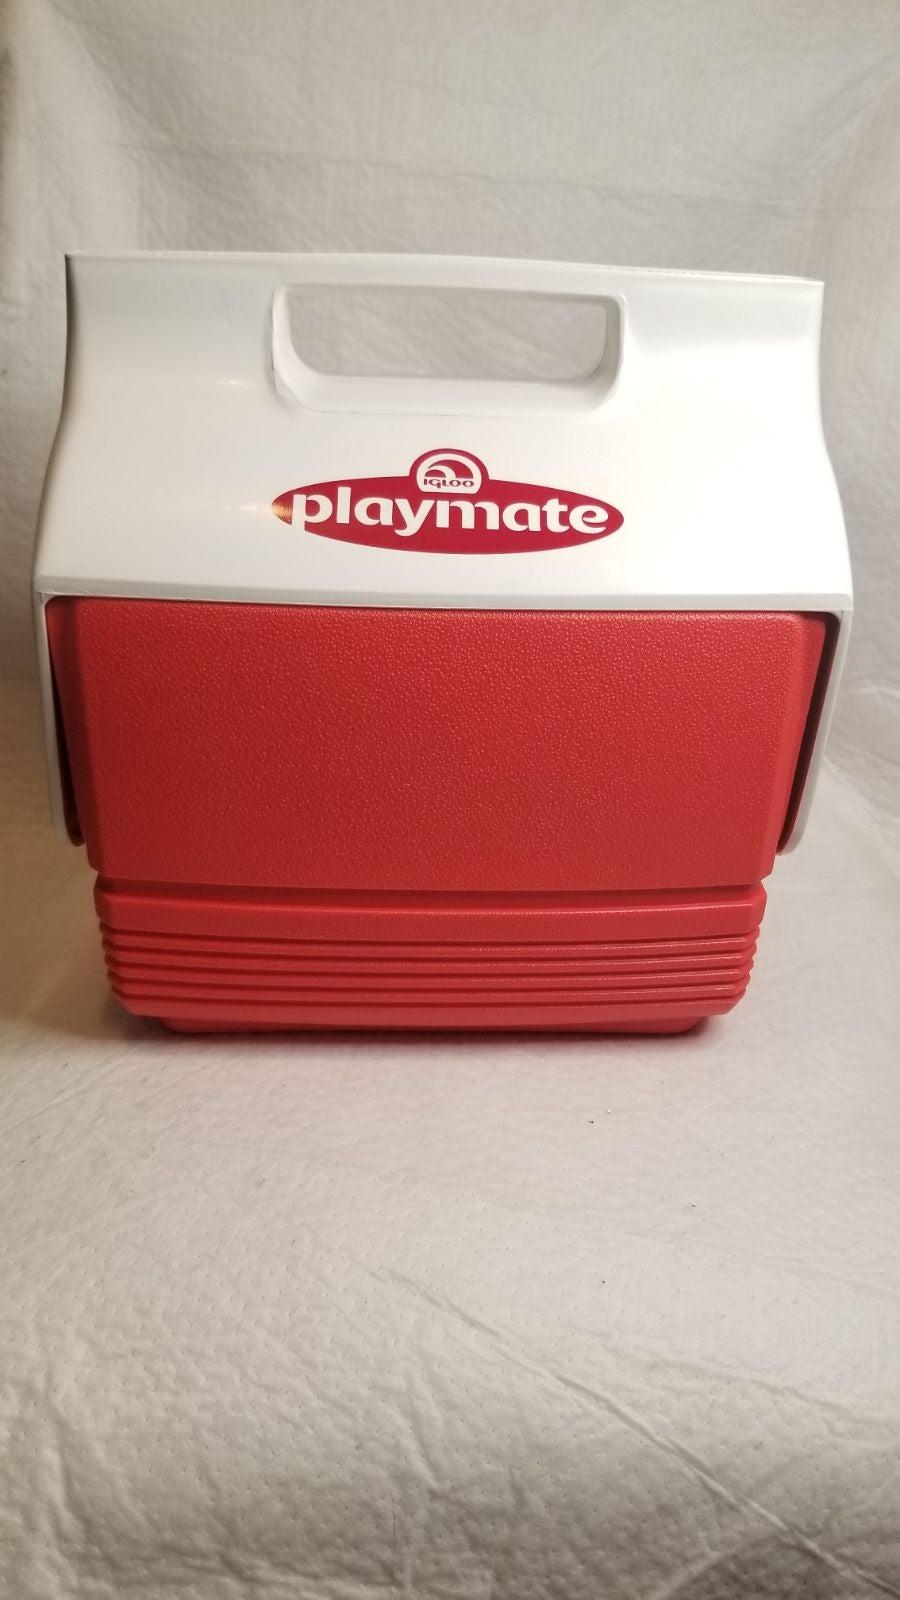 Playmate cooler